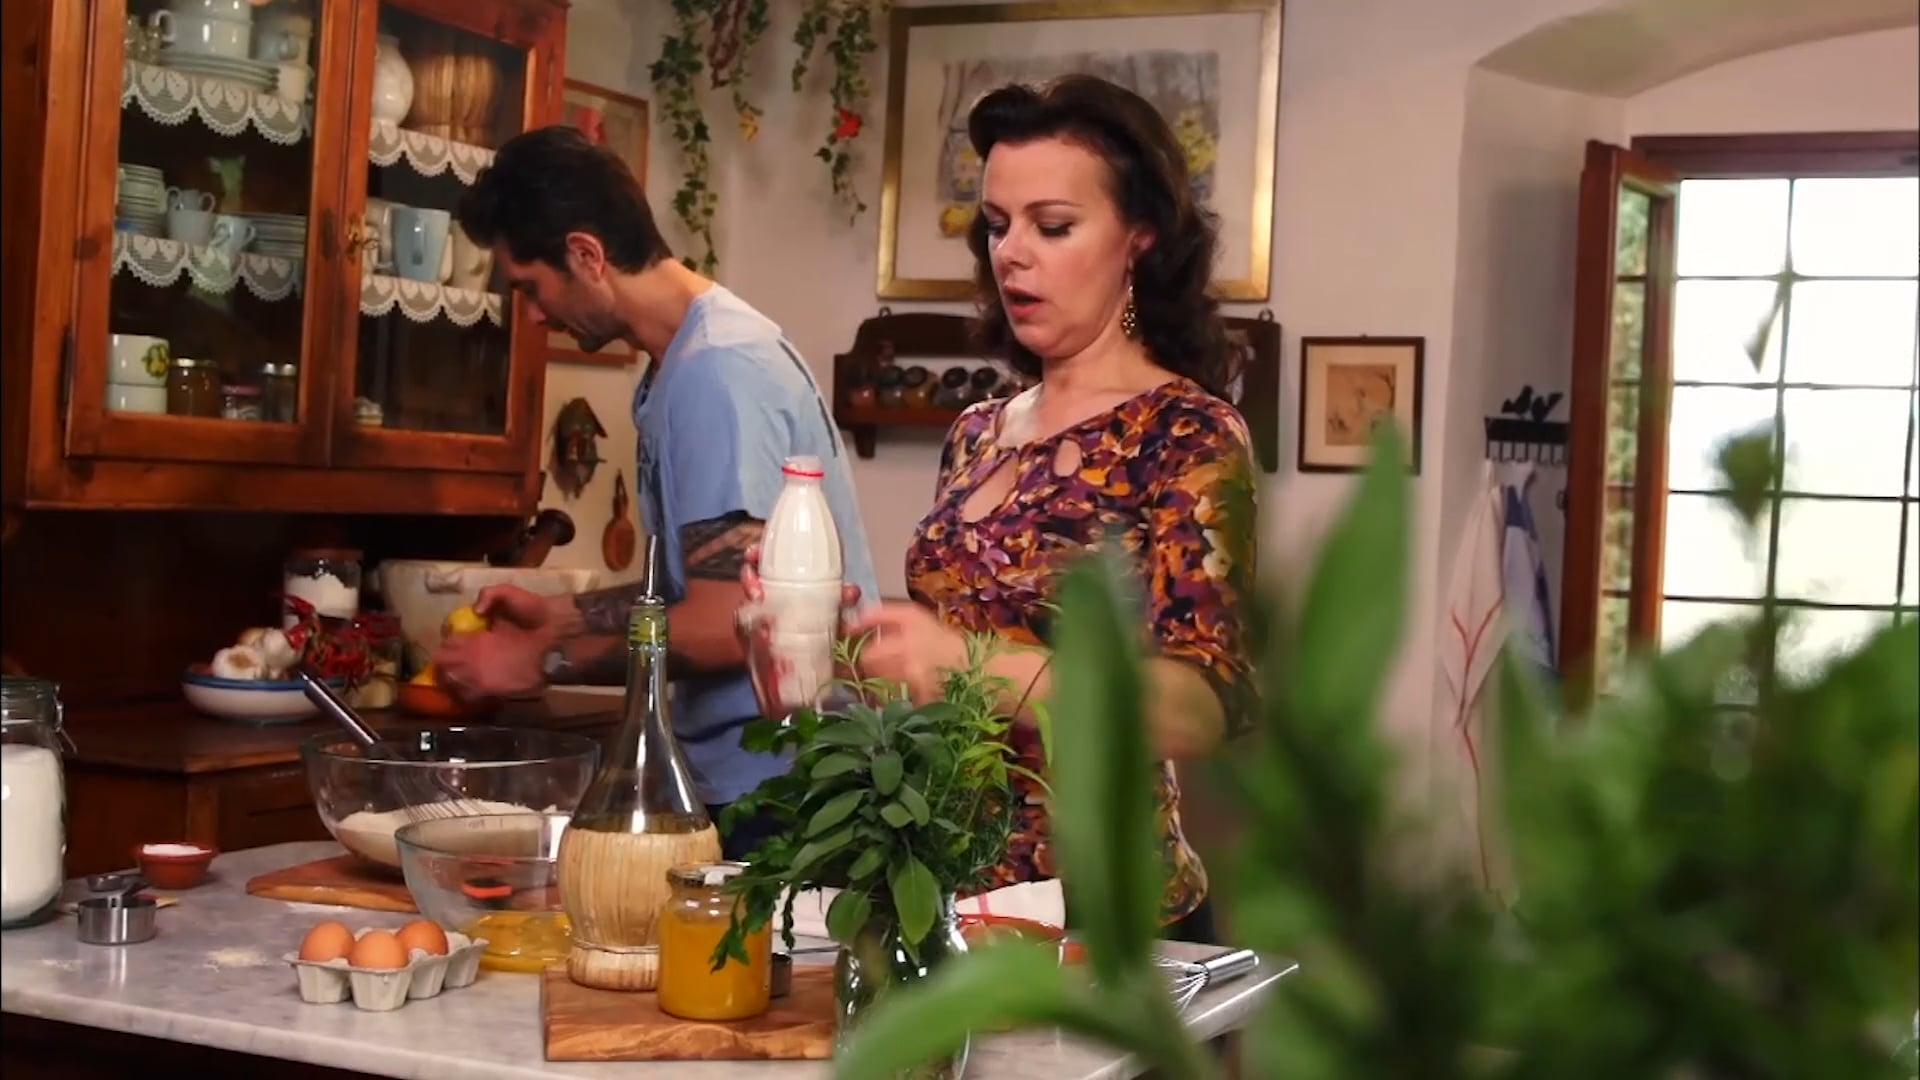 Tuscany-Food and Lifestyle